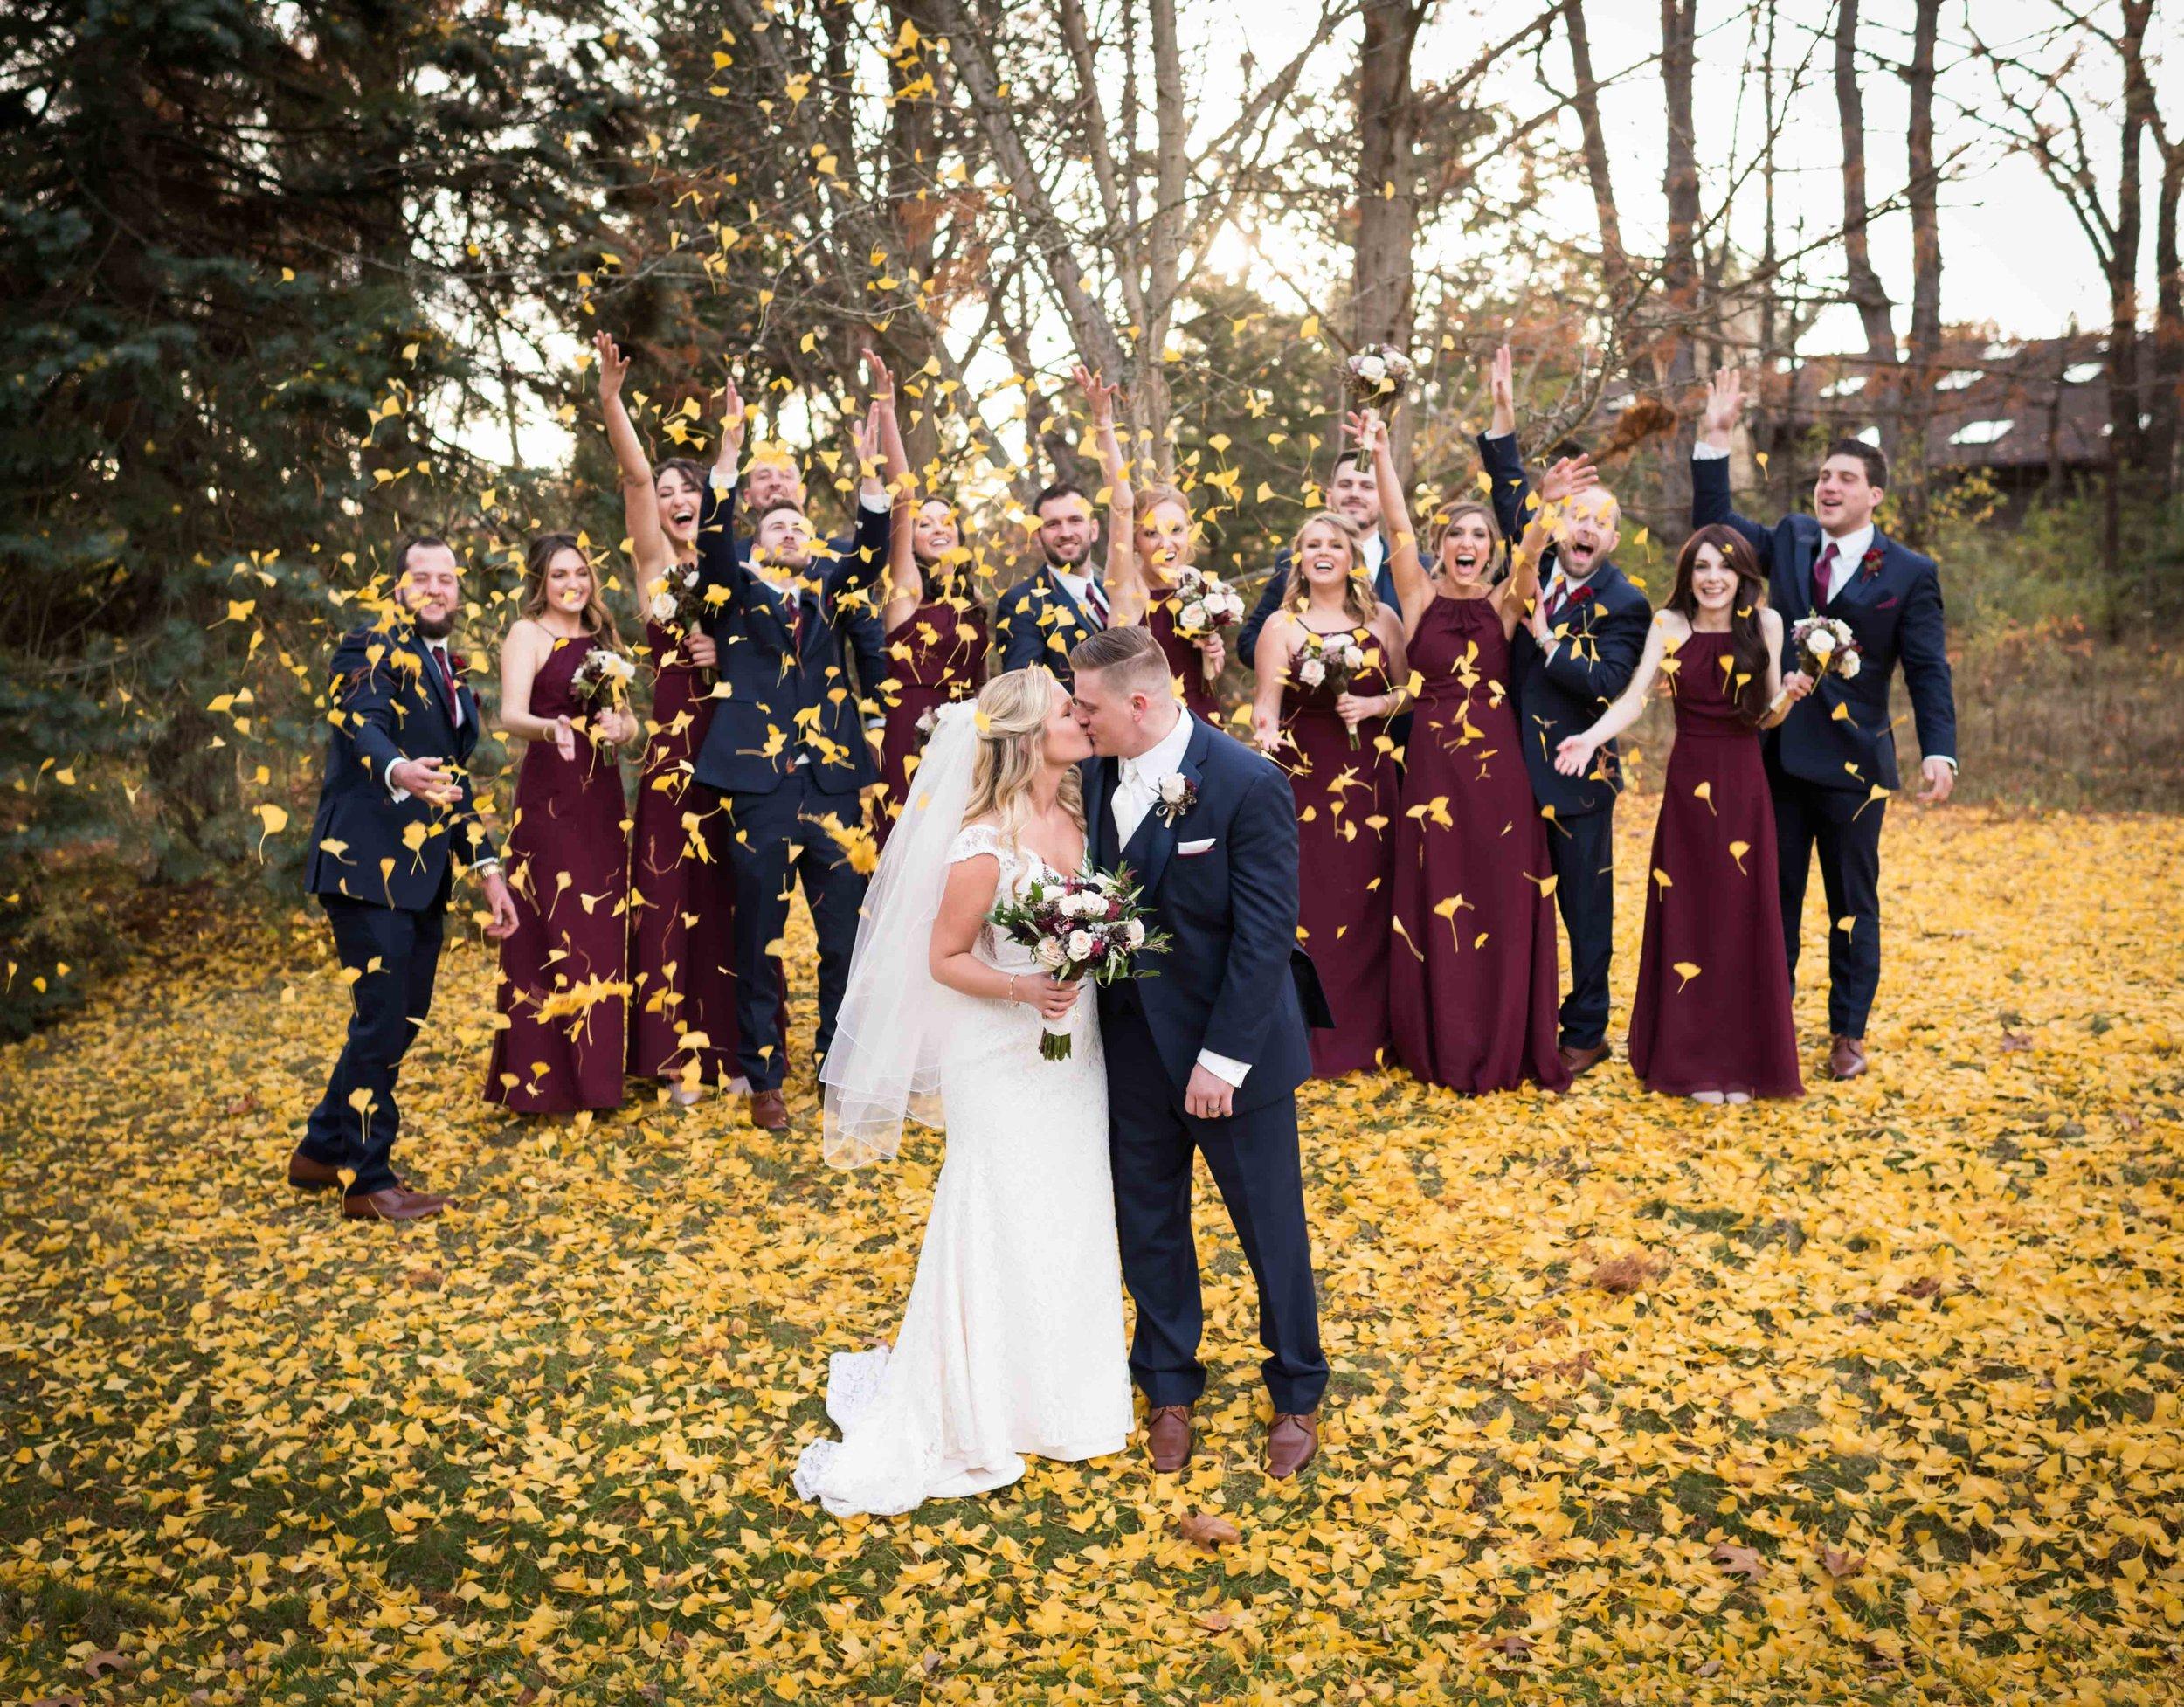 Megan&Kyle11-11-17-635.jpg